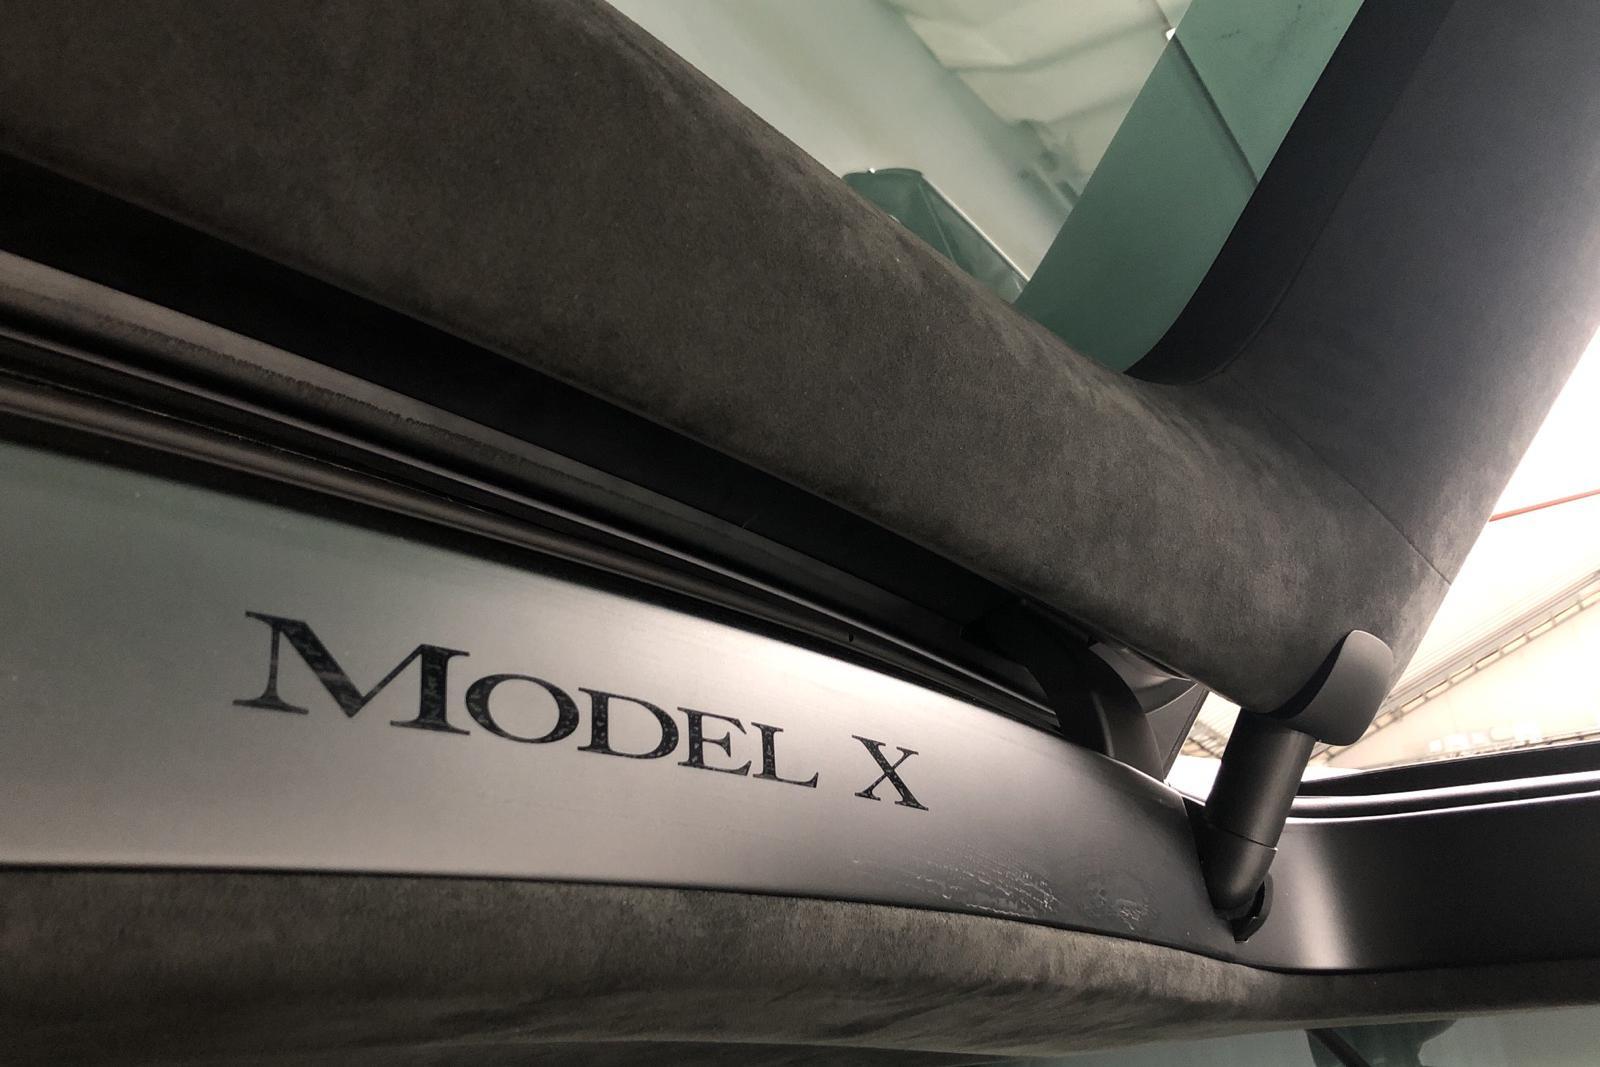 Tesla Model X 75D - 97 310 km - Automatic - black - 2017